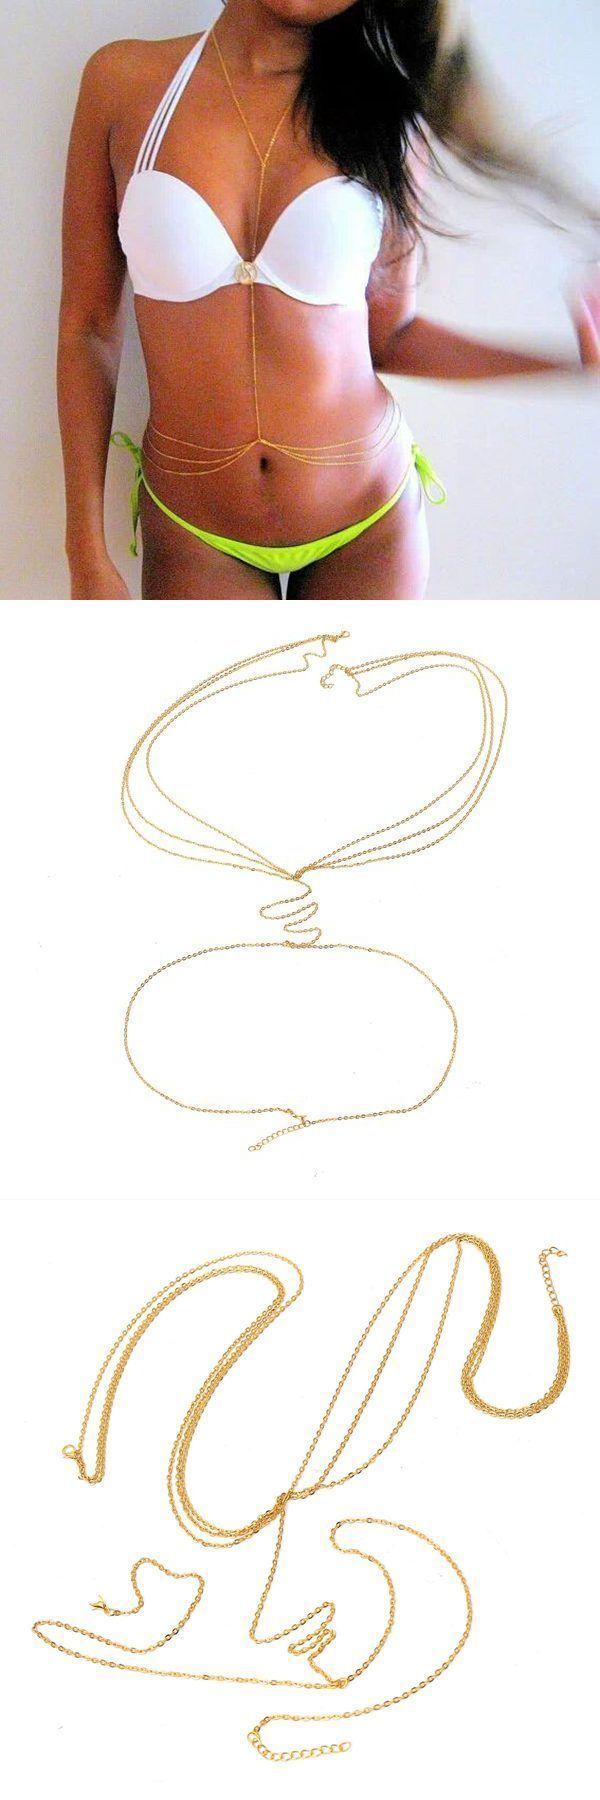 13+ Best body jewelry for sensitive skin info